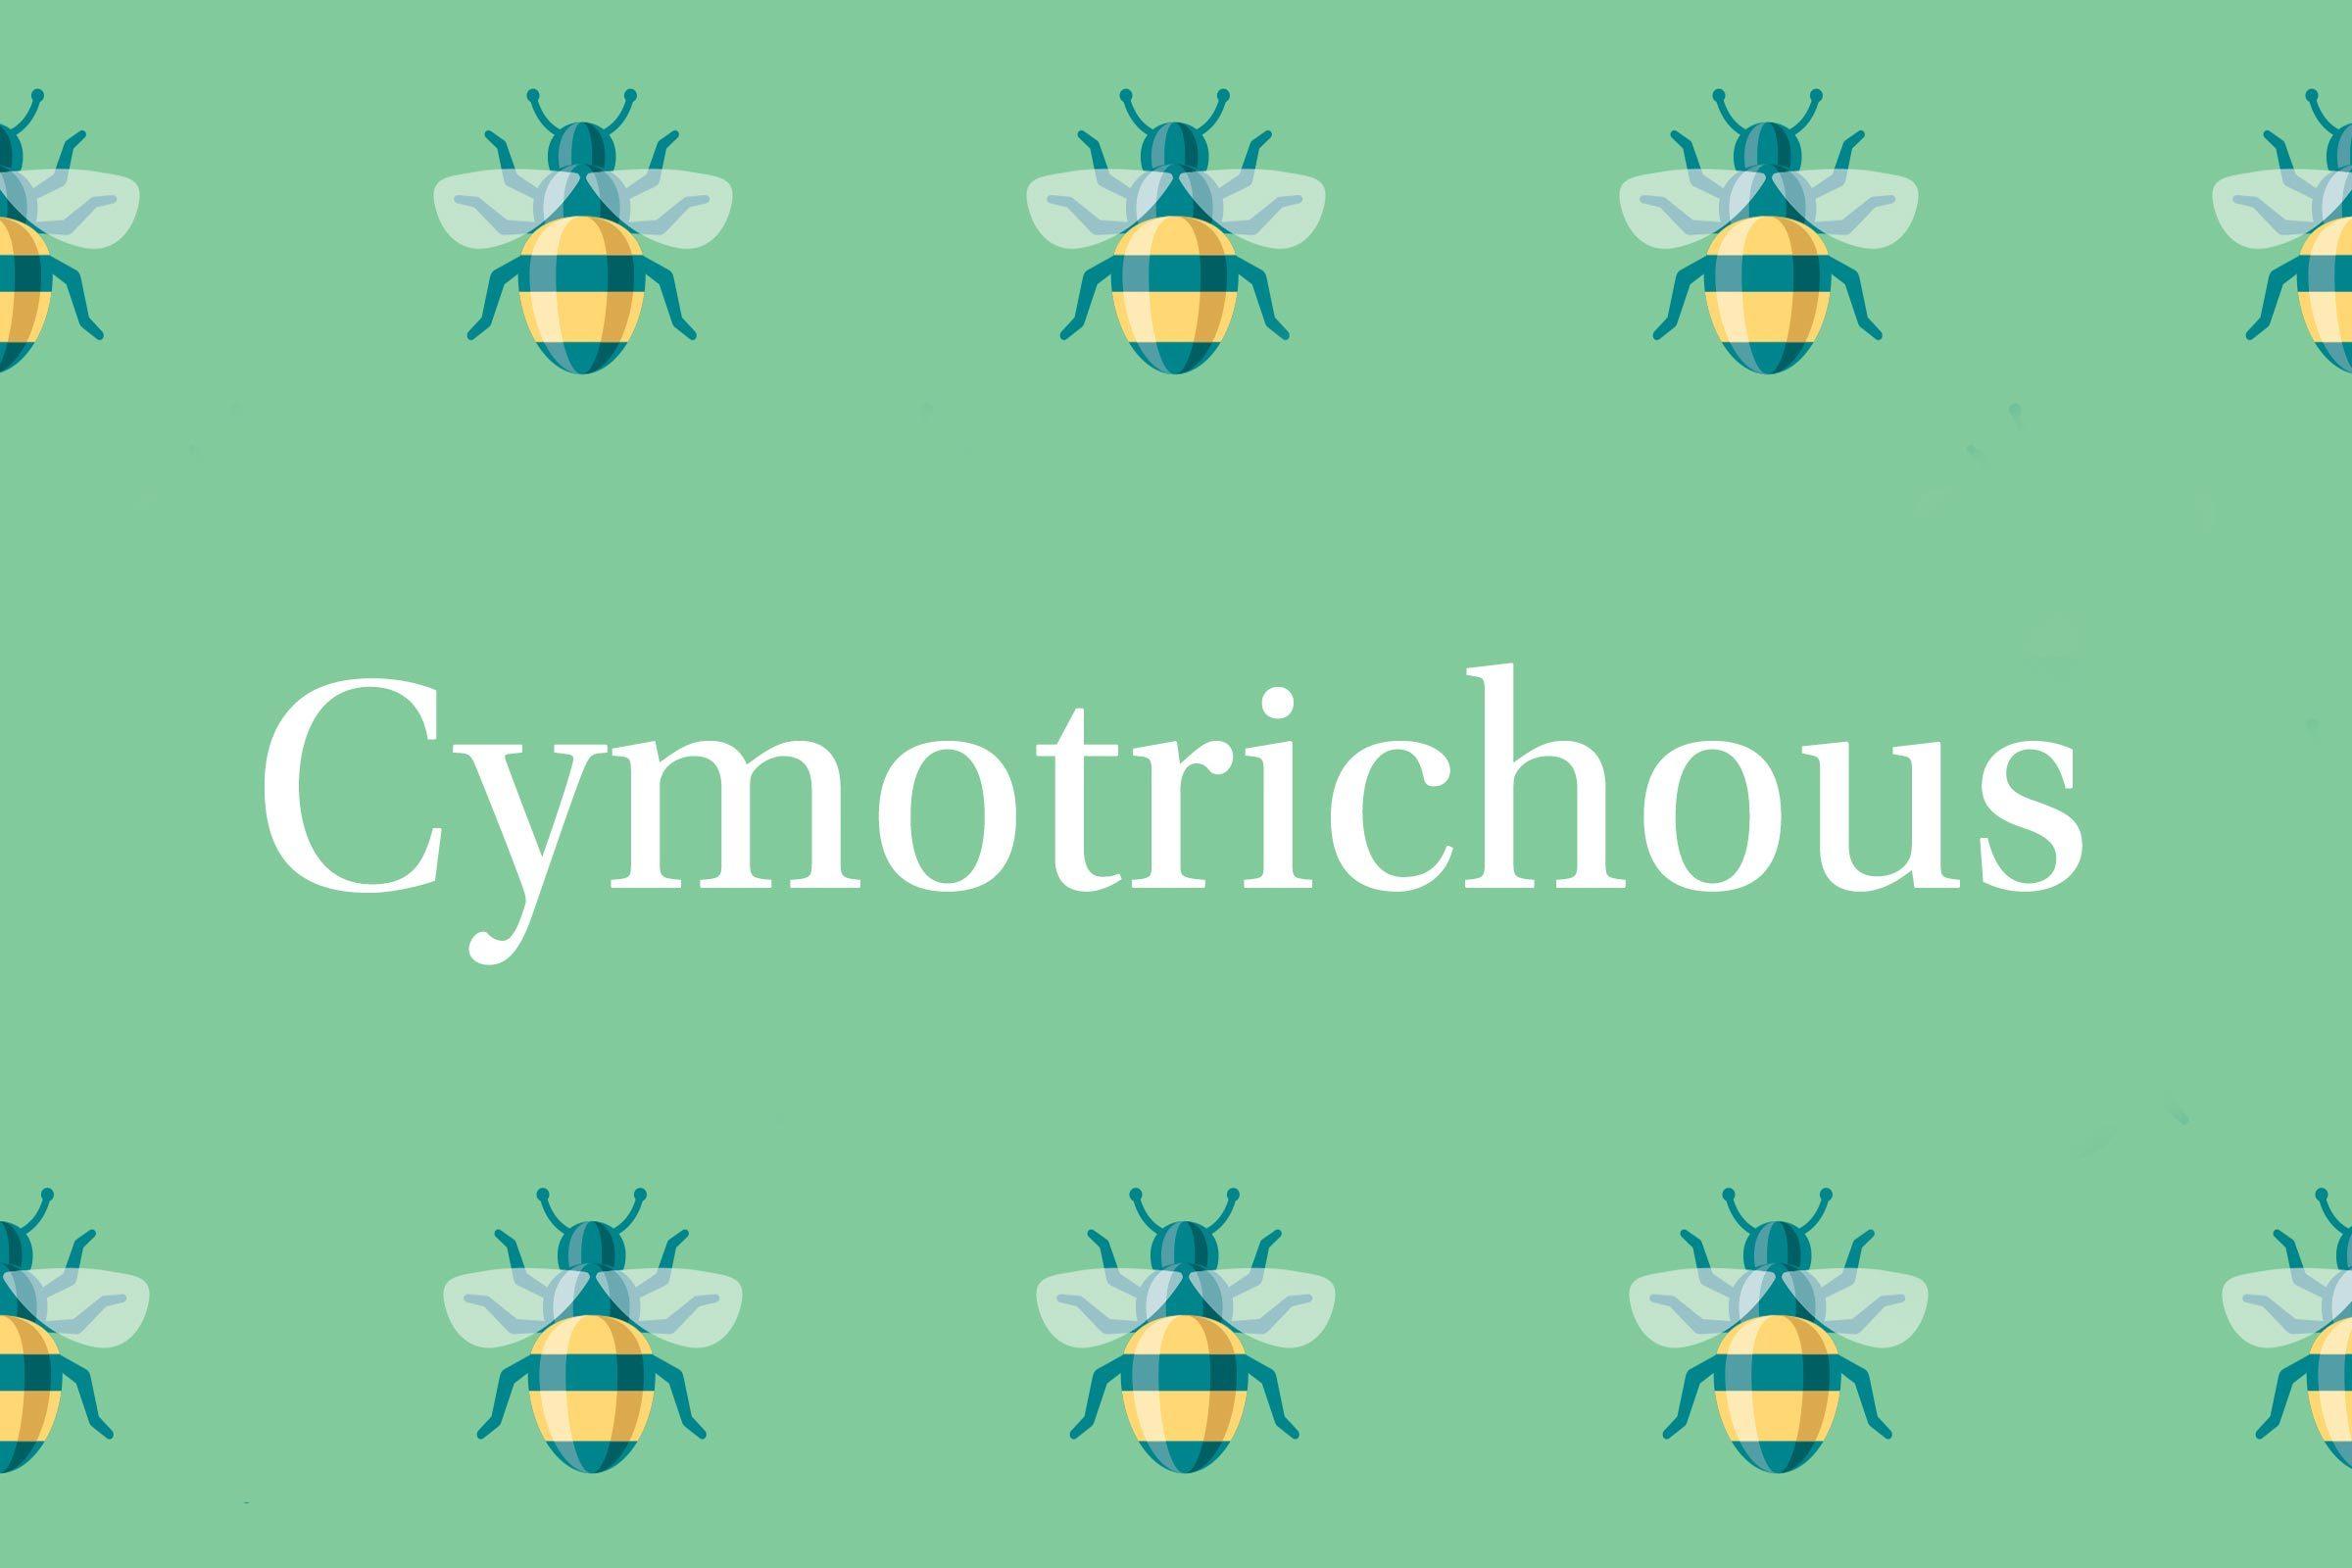 Cymotrichous